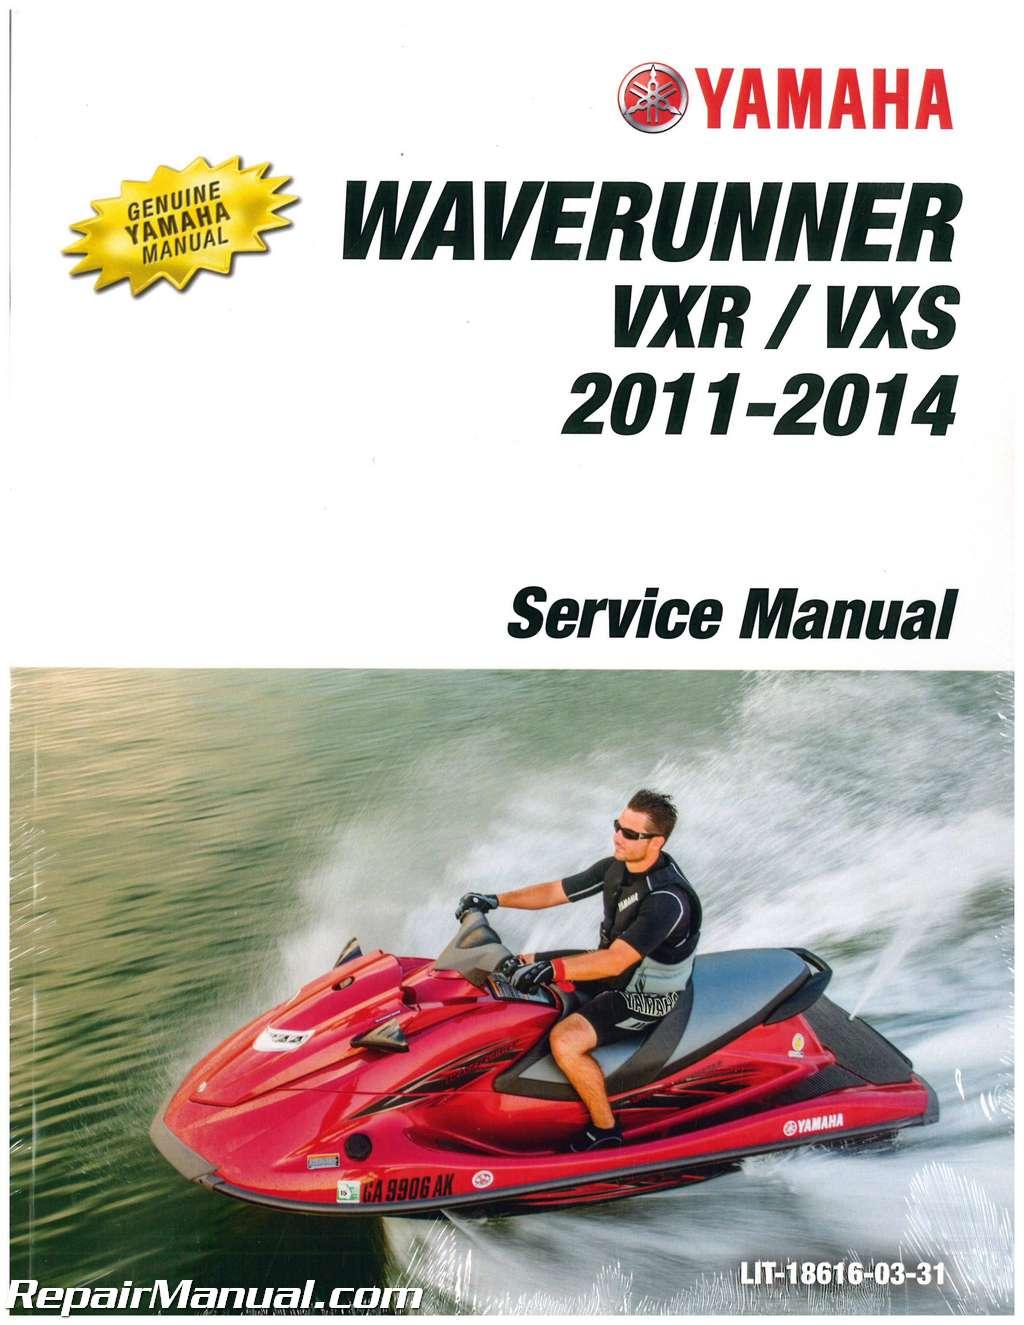 Yamaha Vxr Service Manual